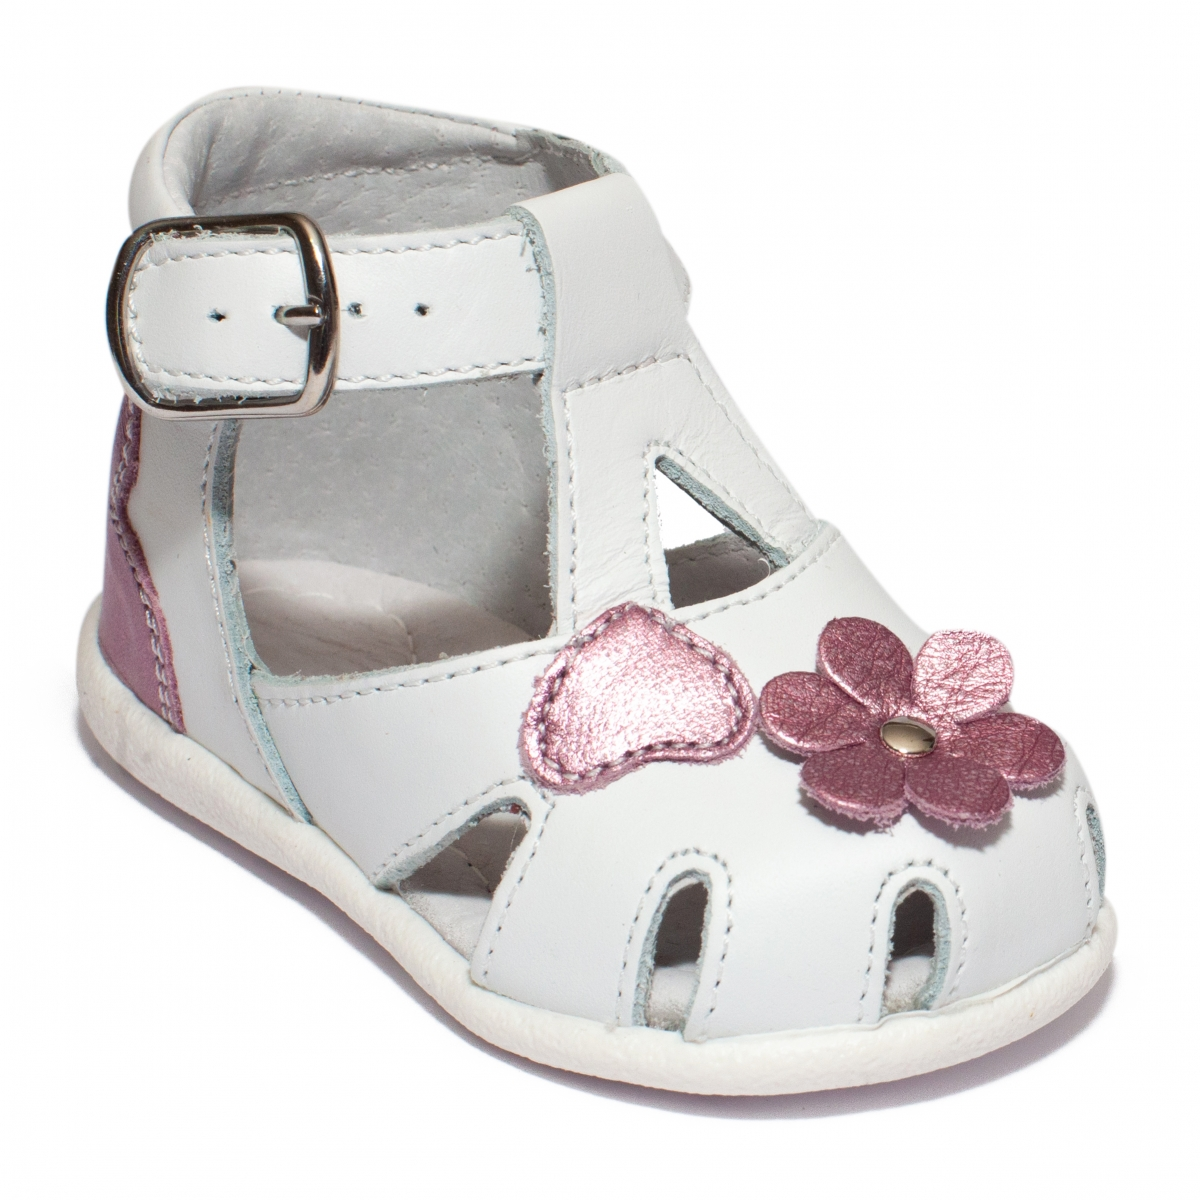 Sandale fete inalte pe glezna hokide 77 alb mov sidef 18-24